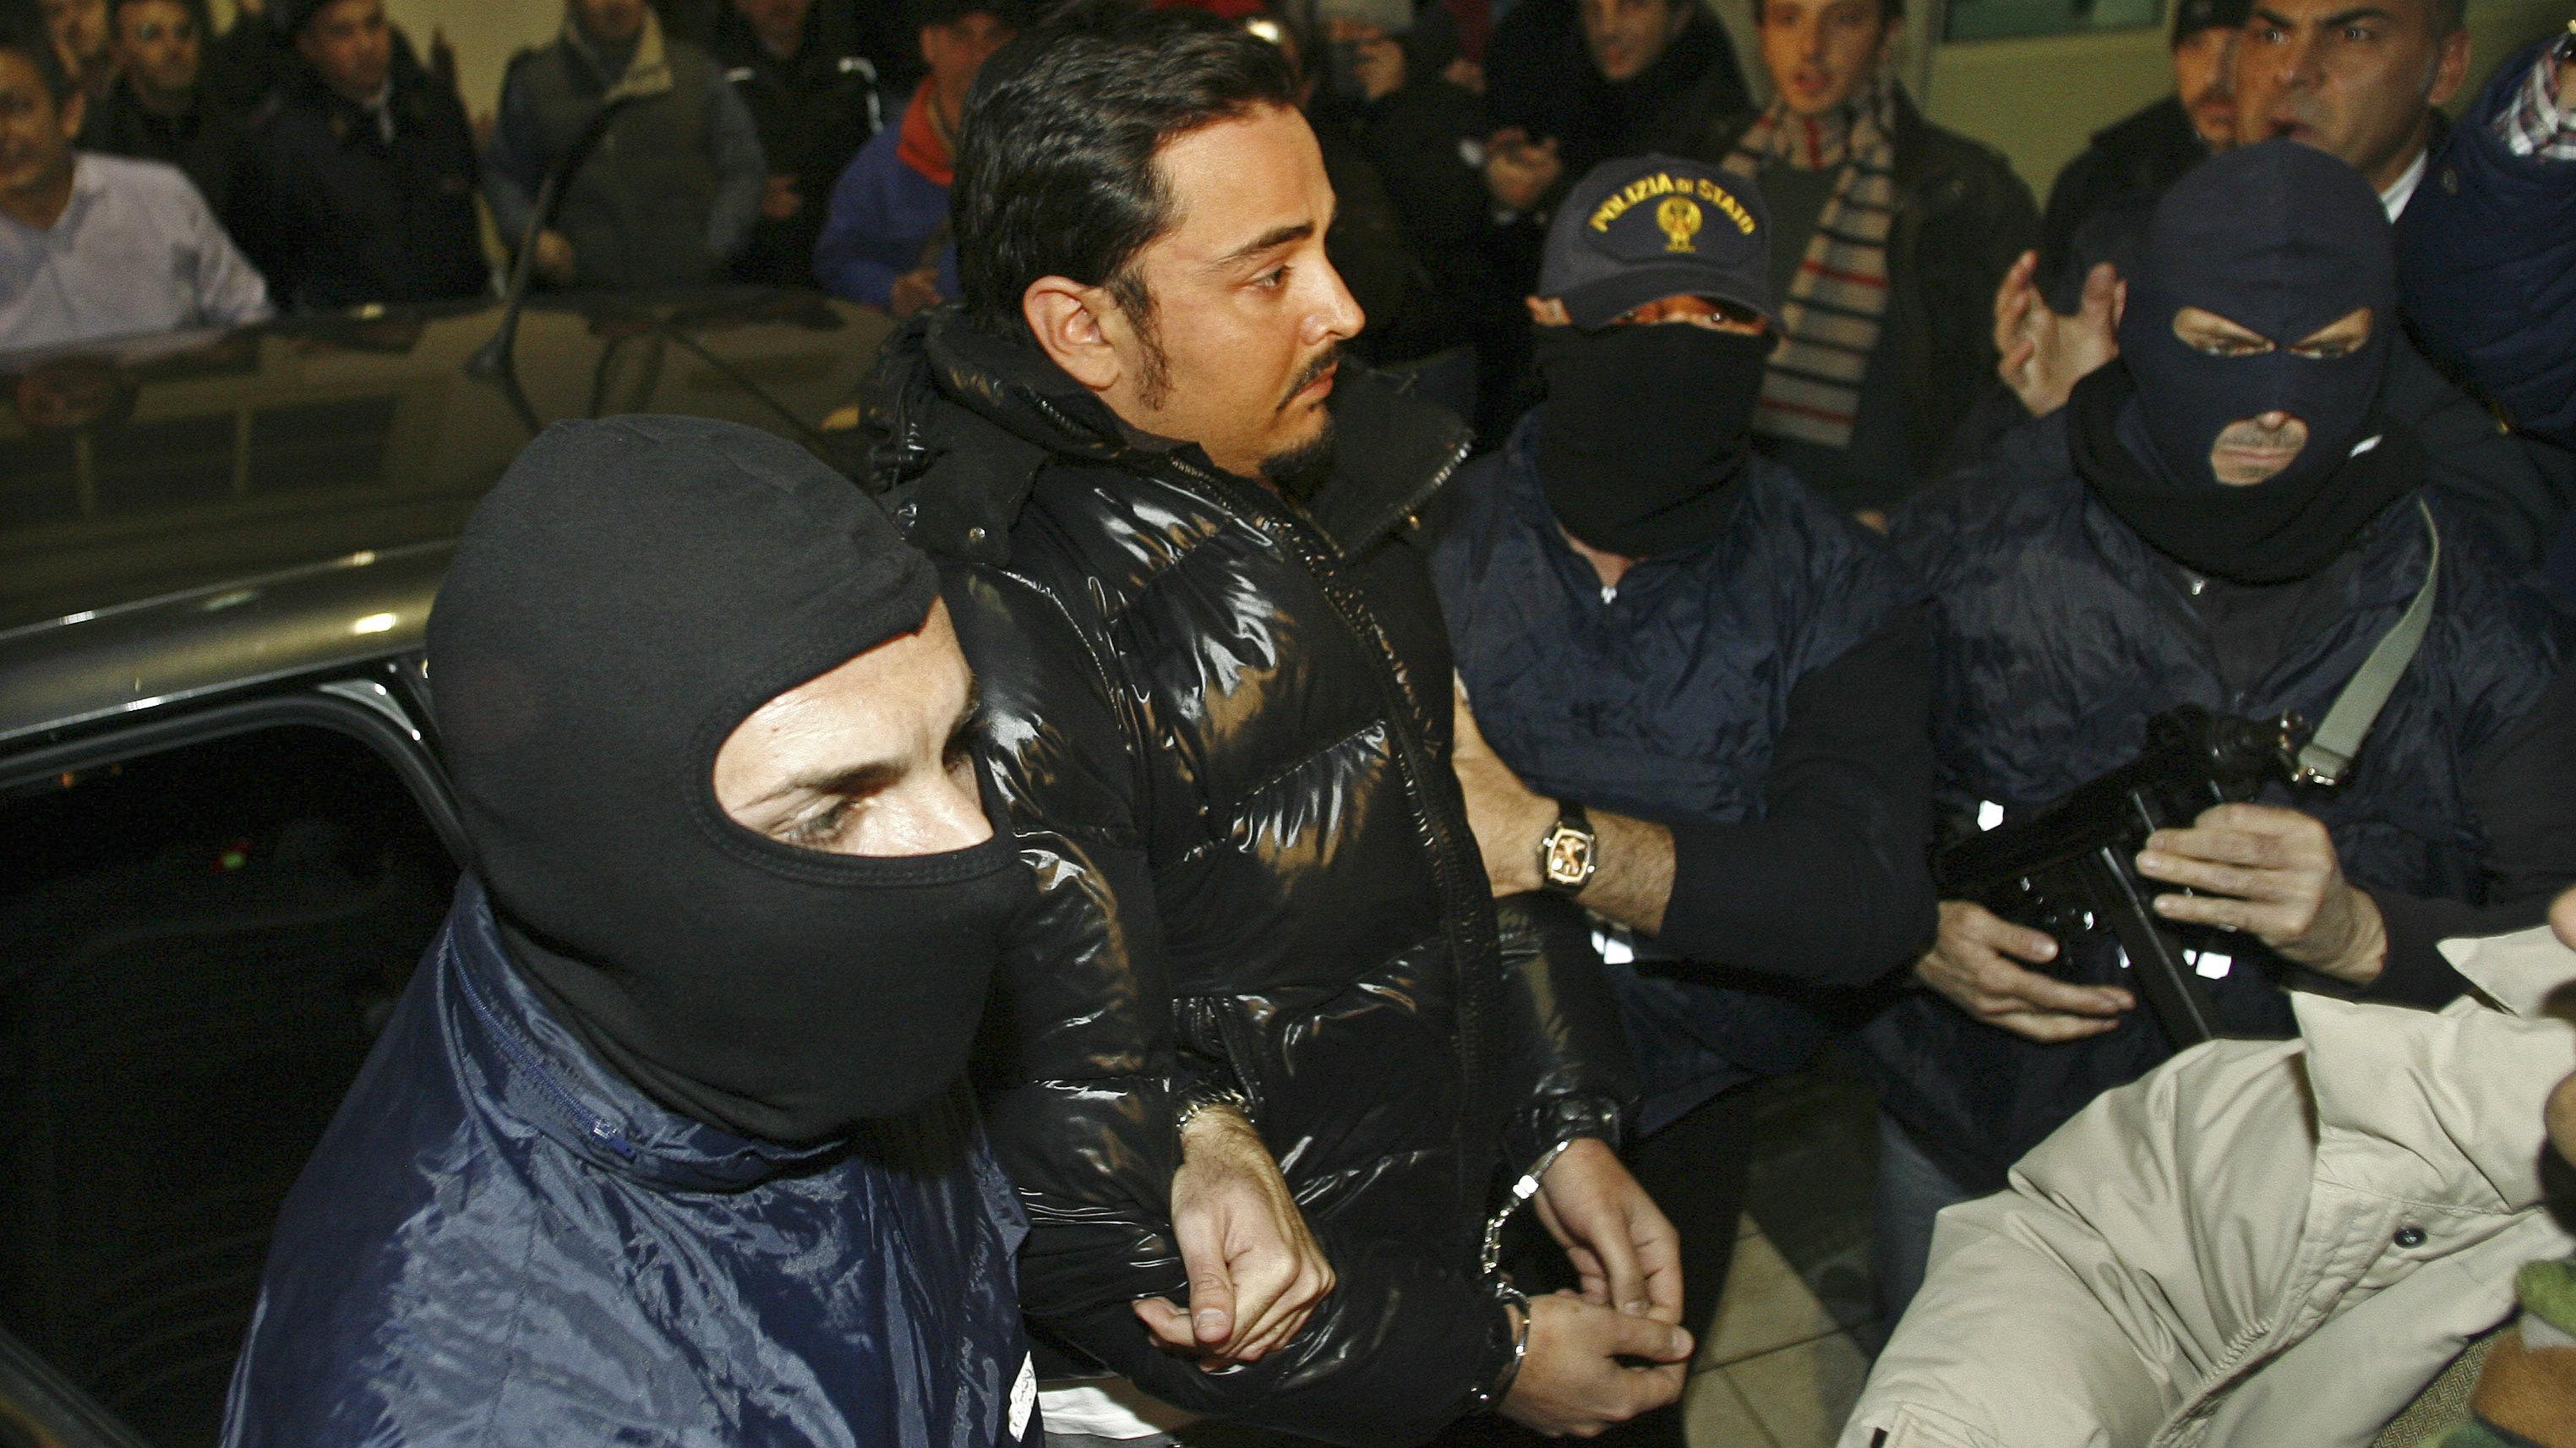 Masked Italian police officers accompany Sicilian Mafia suspect Giovanni Nicchi (C) to a police station in Palermo December 5, 2009.